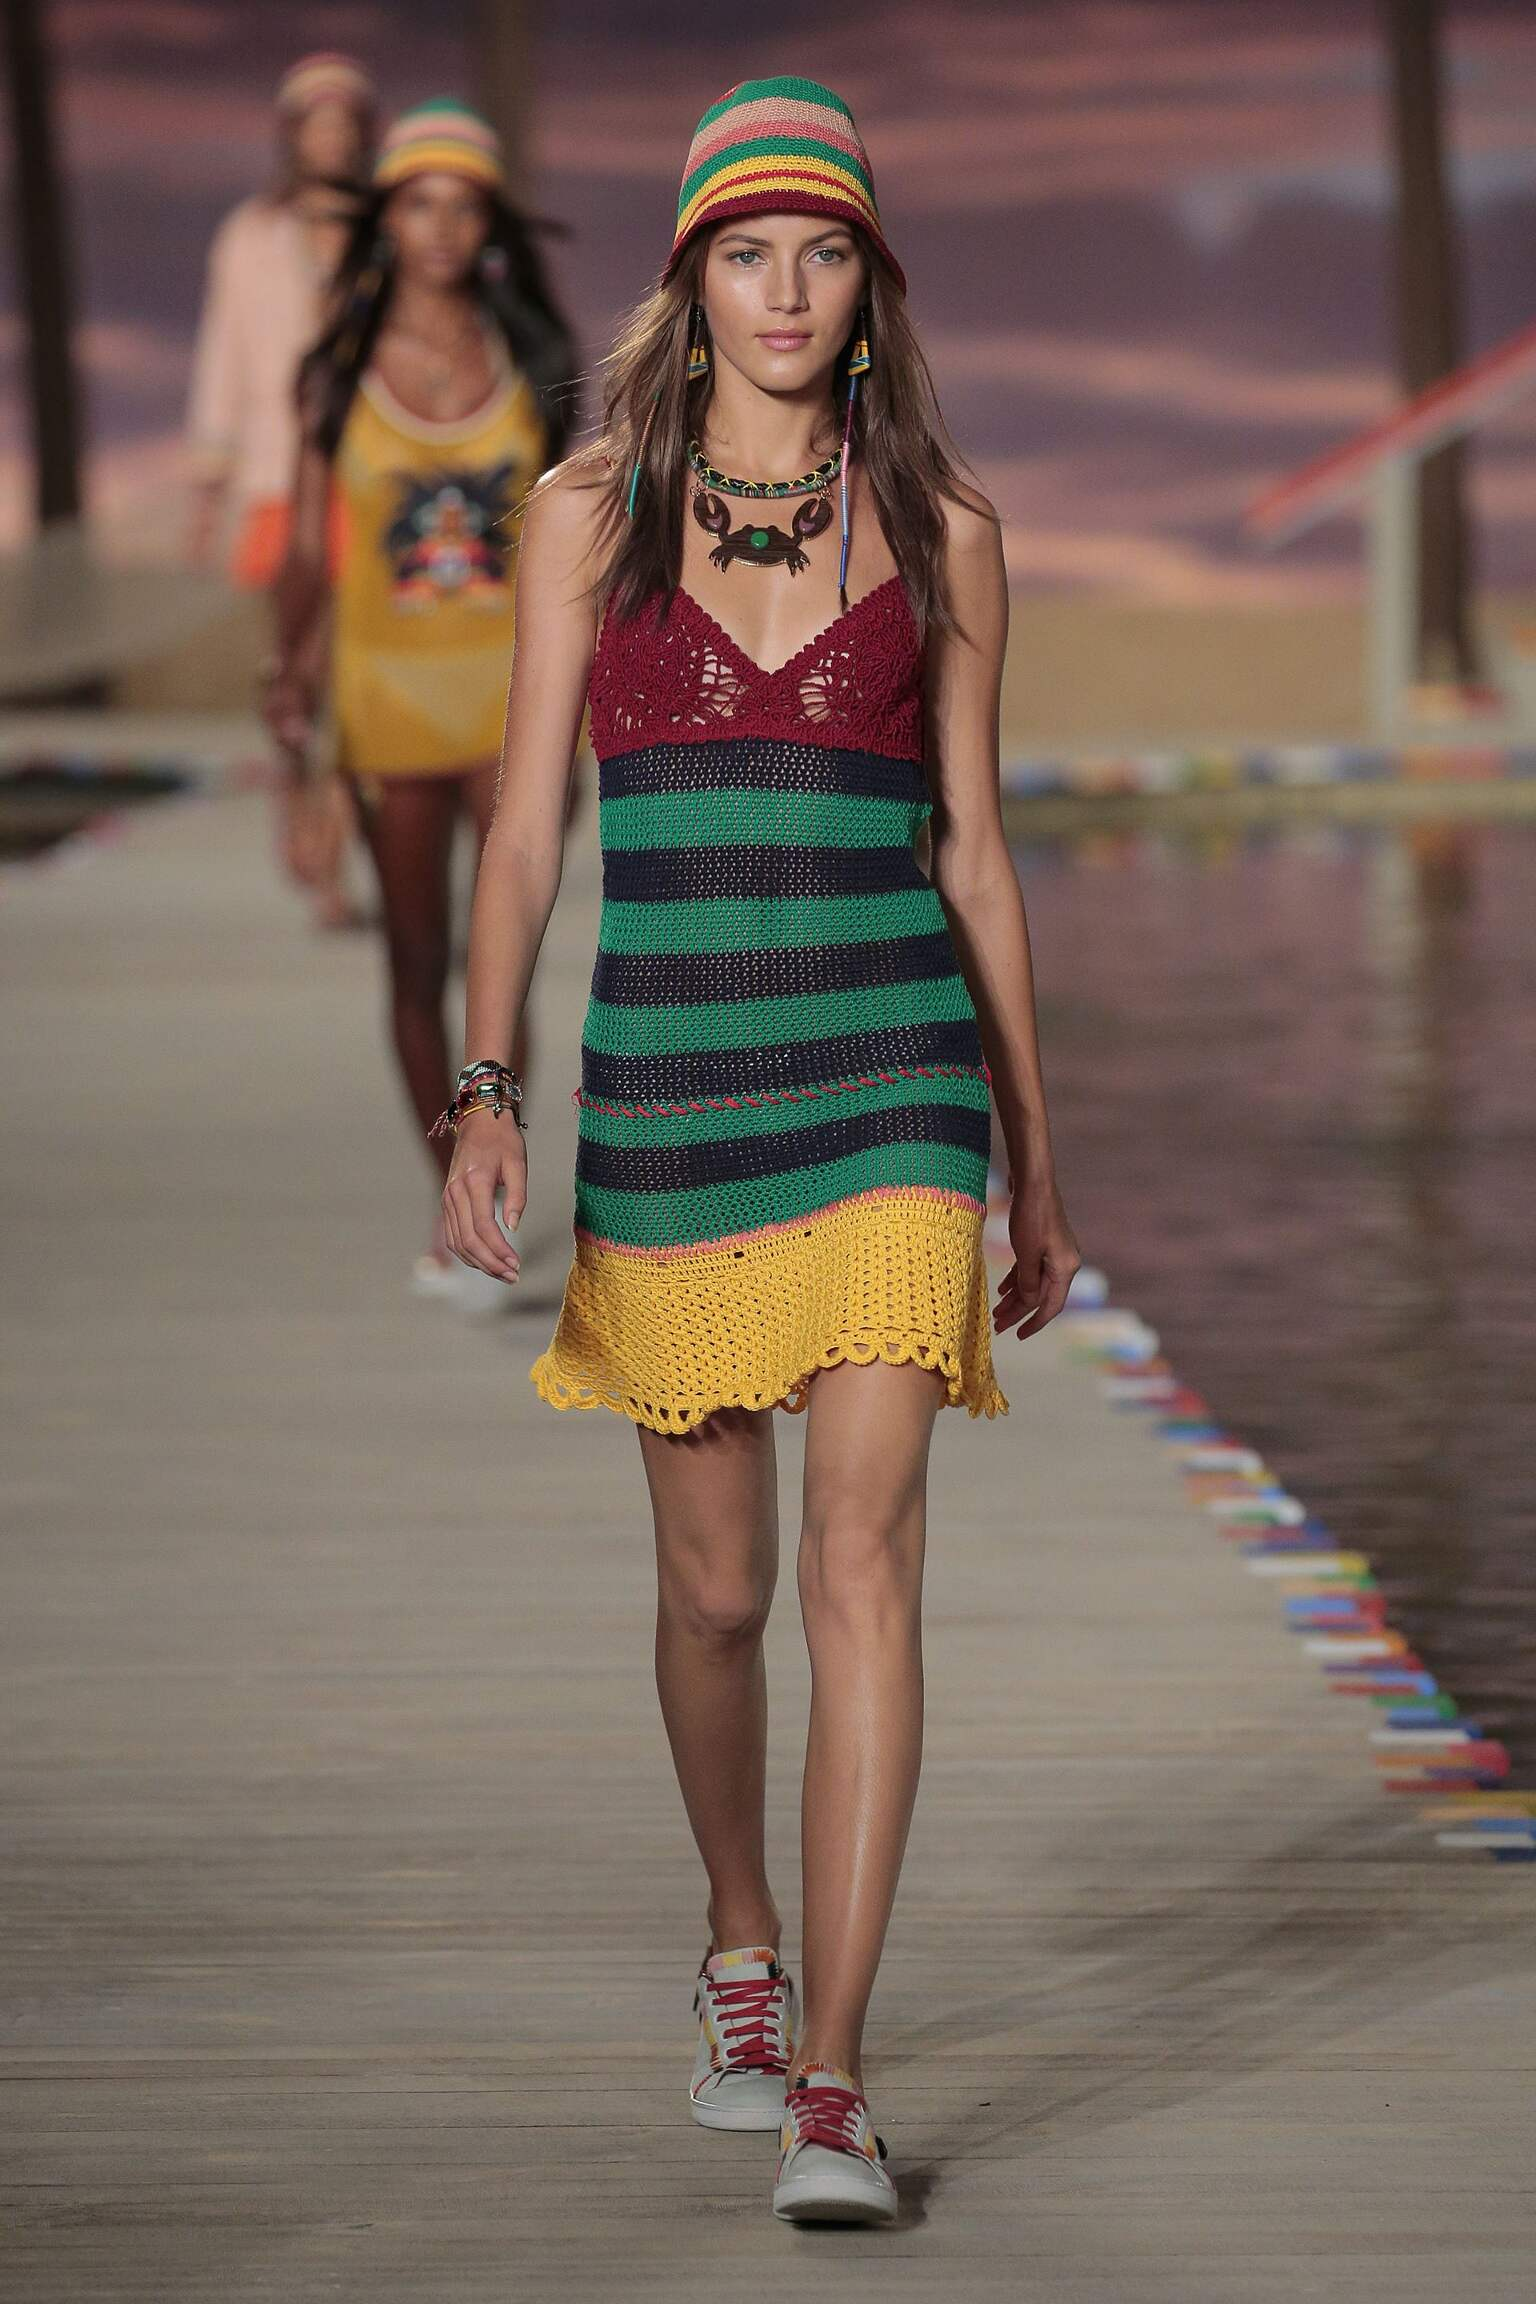 Fashion Woman Model Tommy Hilfiger Catwalk